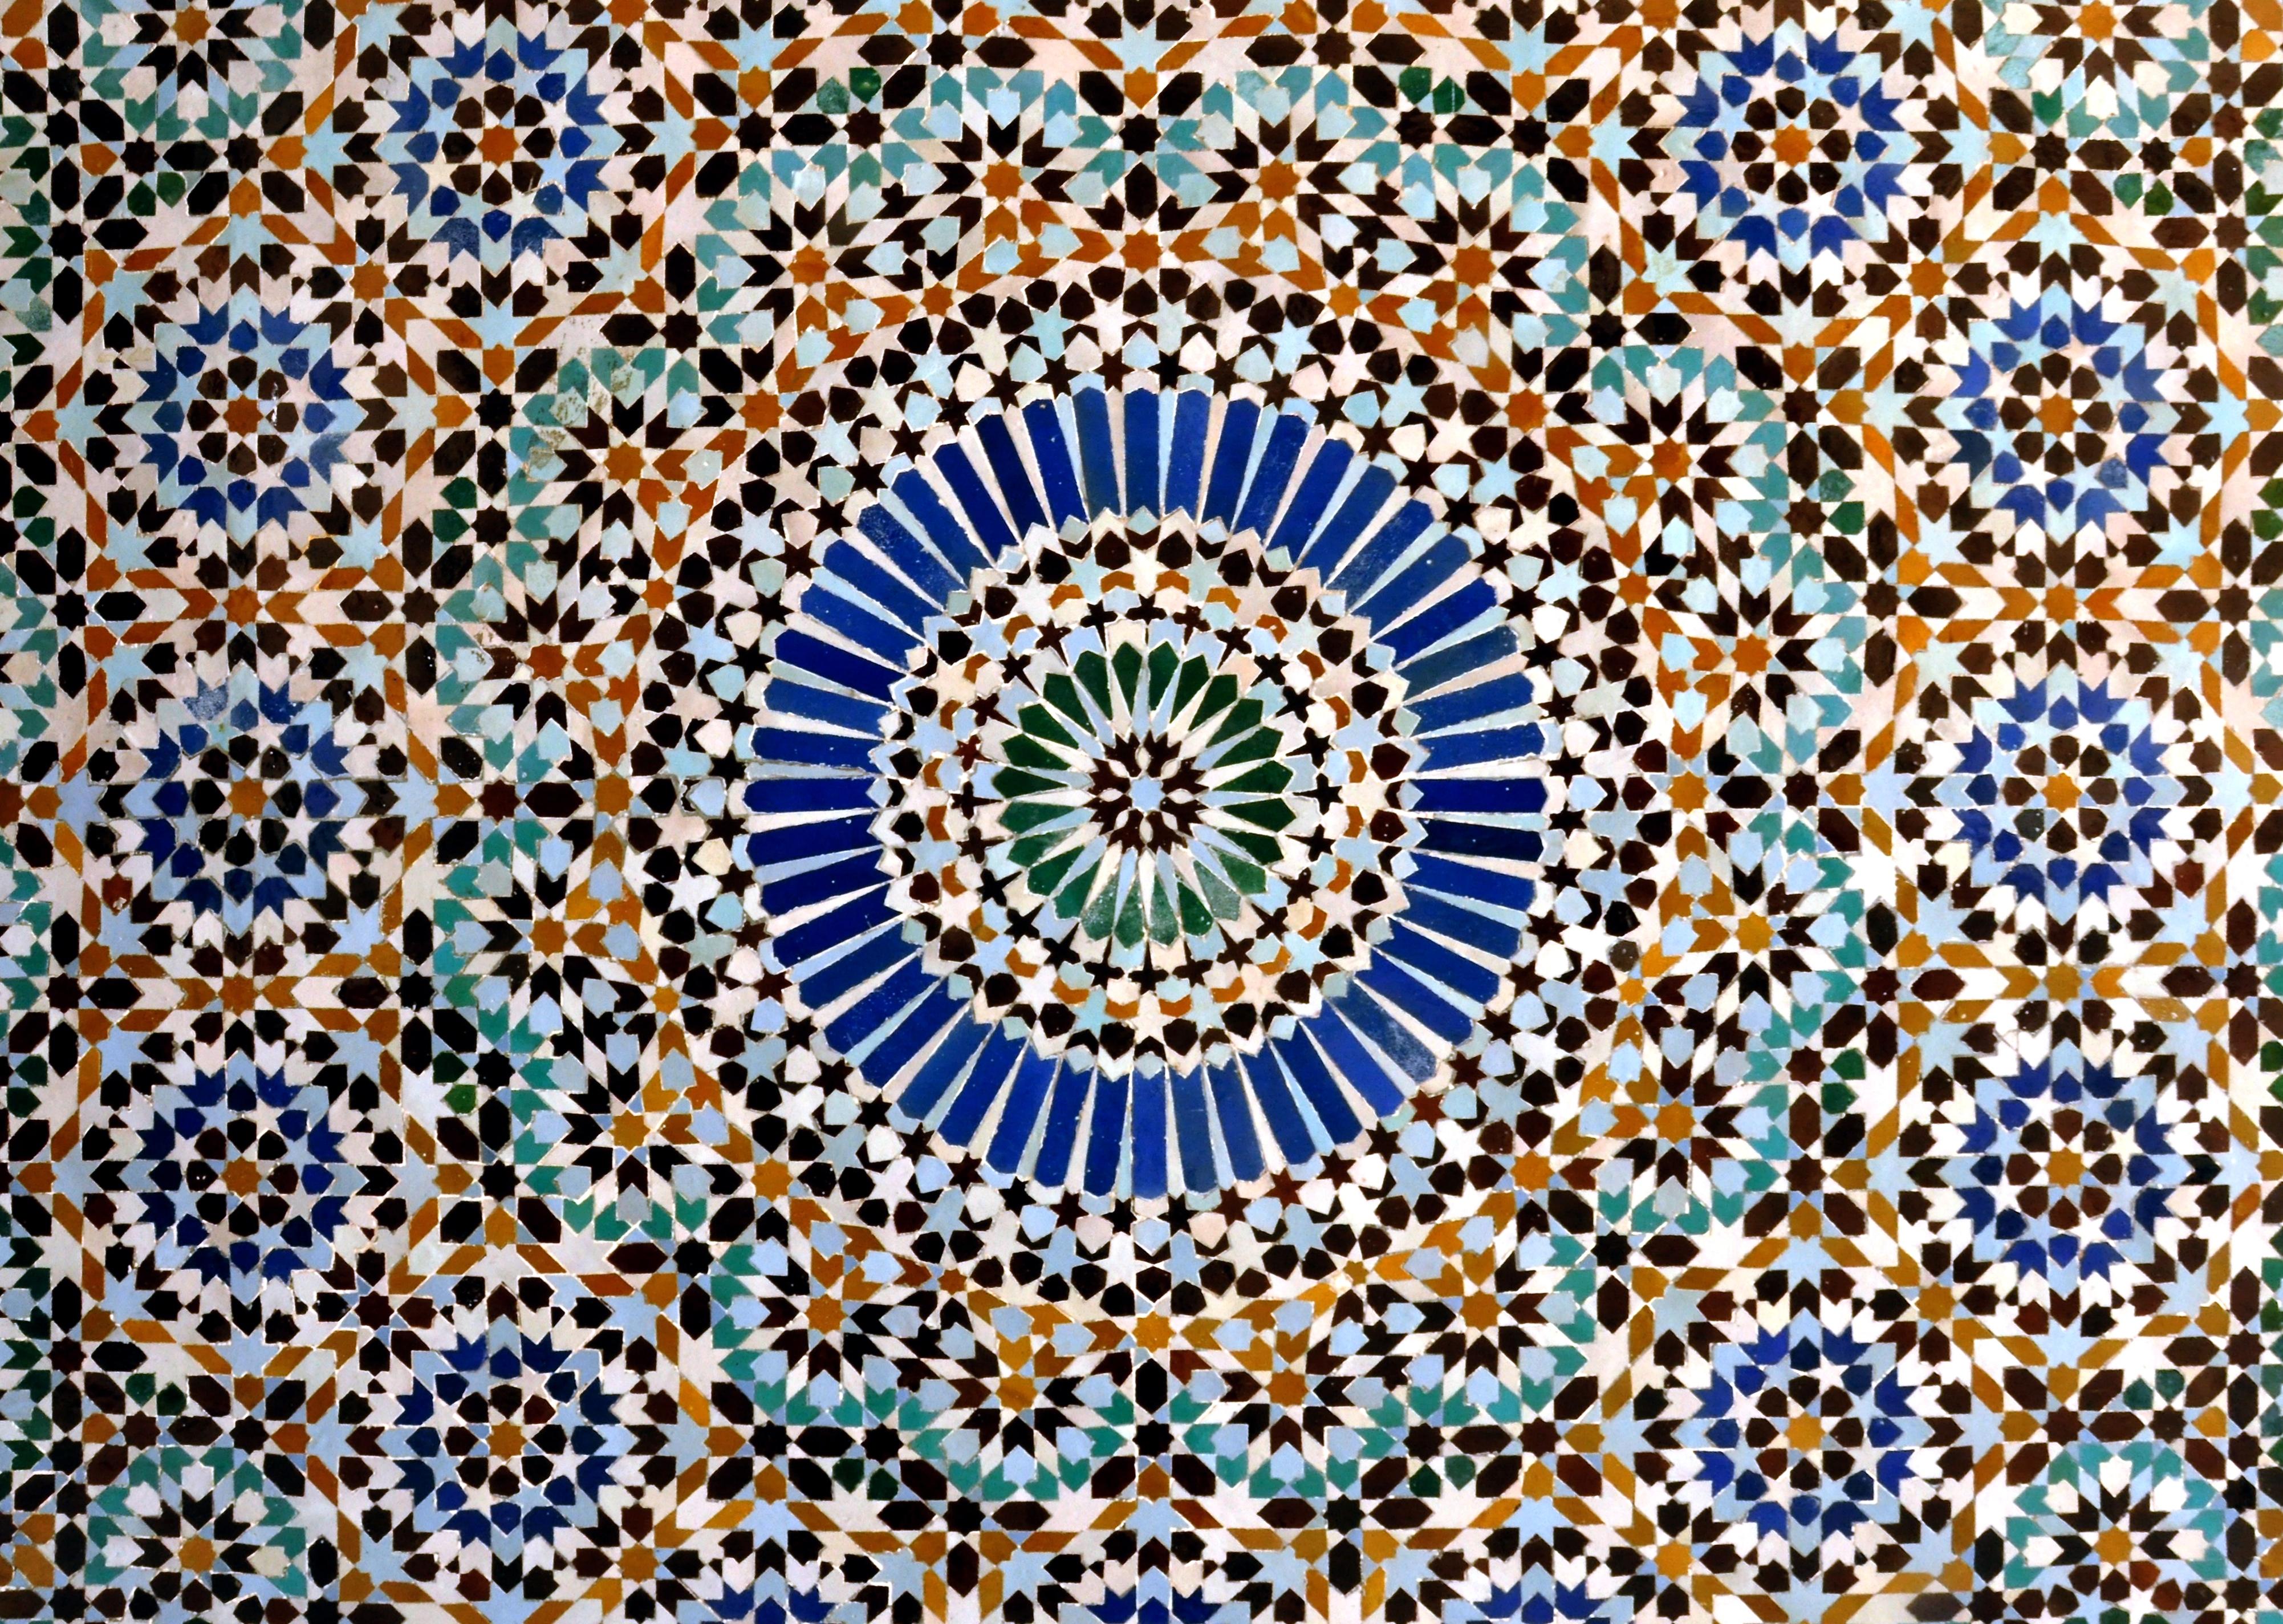 4004x2848 > Mosaic Wallpapers